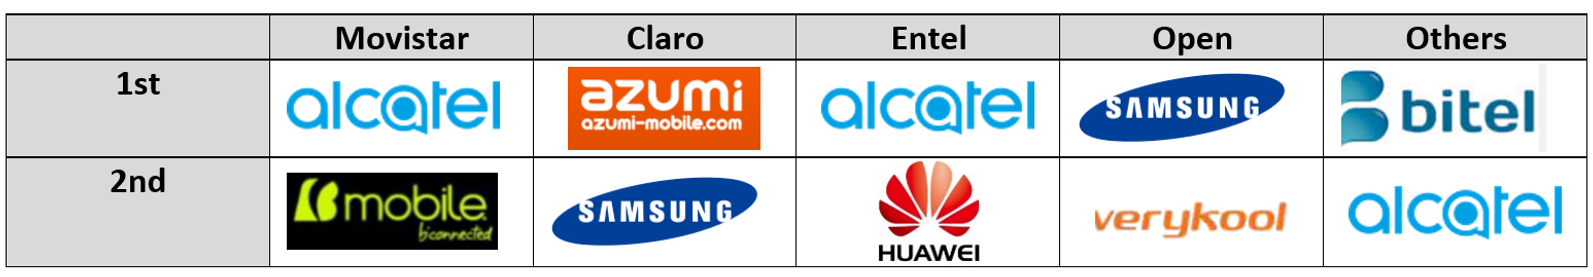 Peru Channel Share